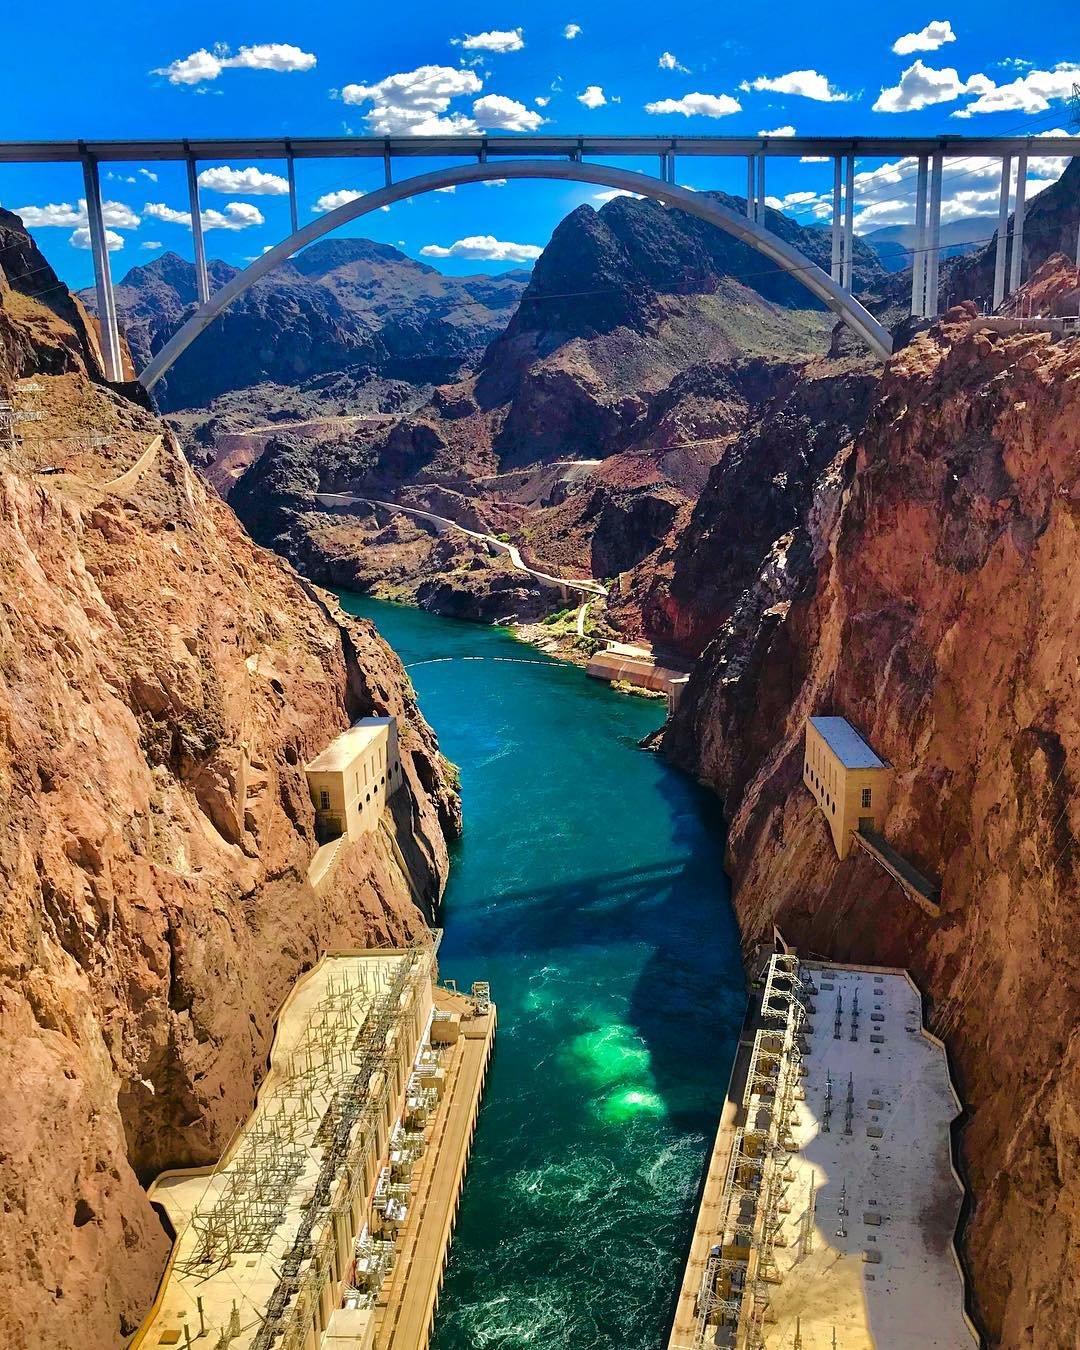 Hot Dam! ^^^^^^^^^^^^^^^^^^^^^^^^^^^^^^^^^^^^^^^^^^^^^^^^^^^^ #hooverdam #hoover #dam #nevada #ohdam #bridge #blueskies #coloradoriver #lakemead #canyons #explore #escape #adventure #travel #wander #wanderlust #wow #america #west #gowest #explorenevada #visitnevada #mountains #western #wonderfulworld #amazed